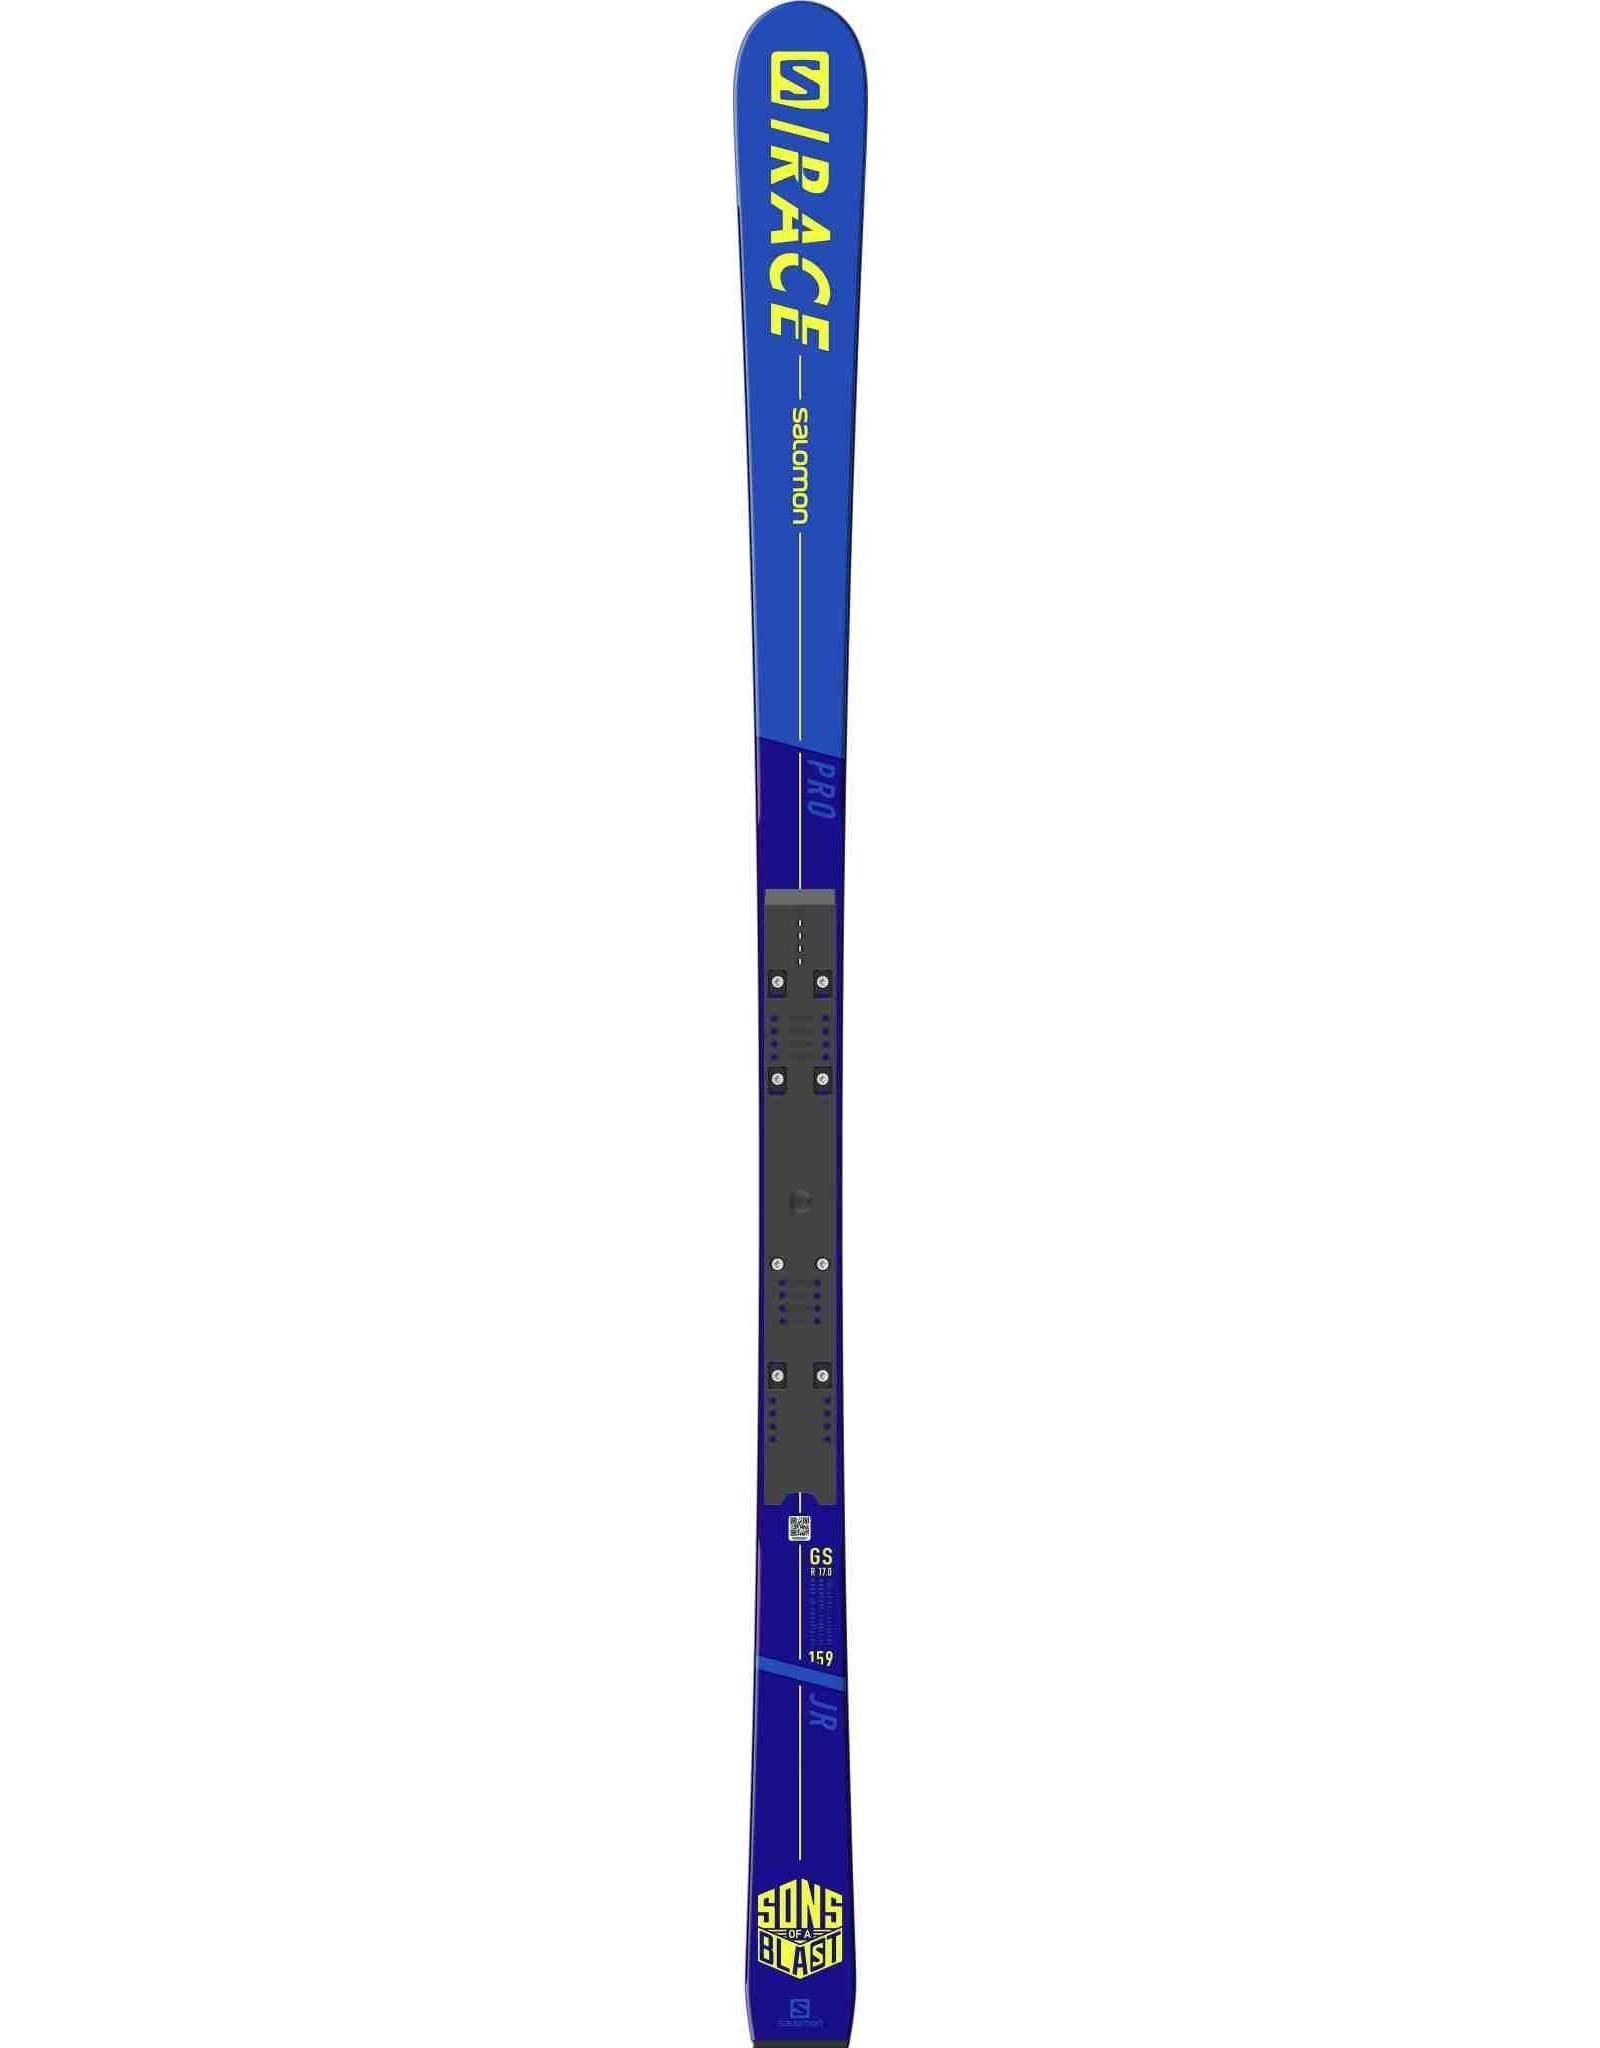 SALOMON SALOMON ALPINE SKI RACE PRO GS FIX-IN JR 20 159